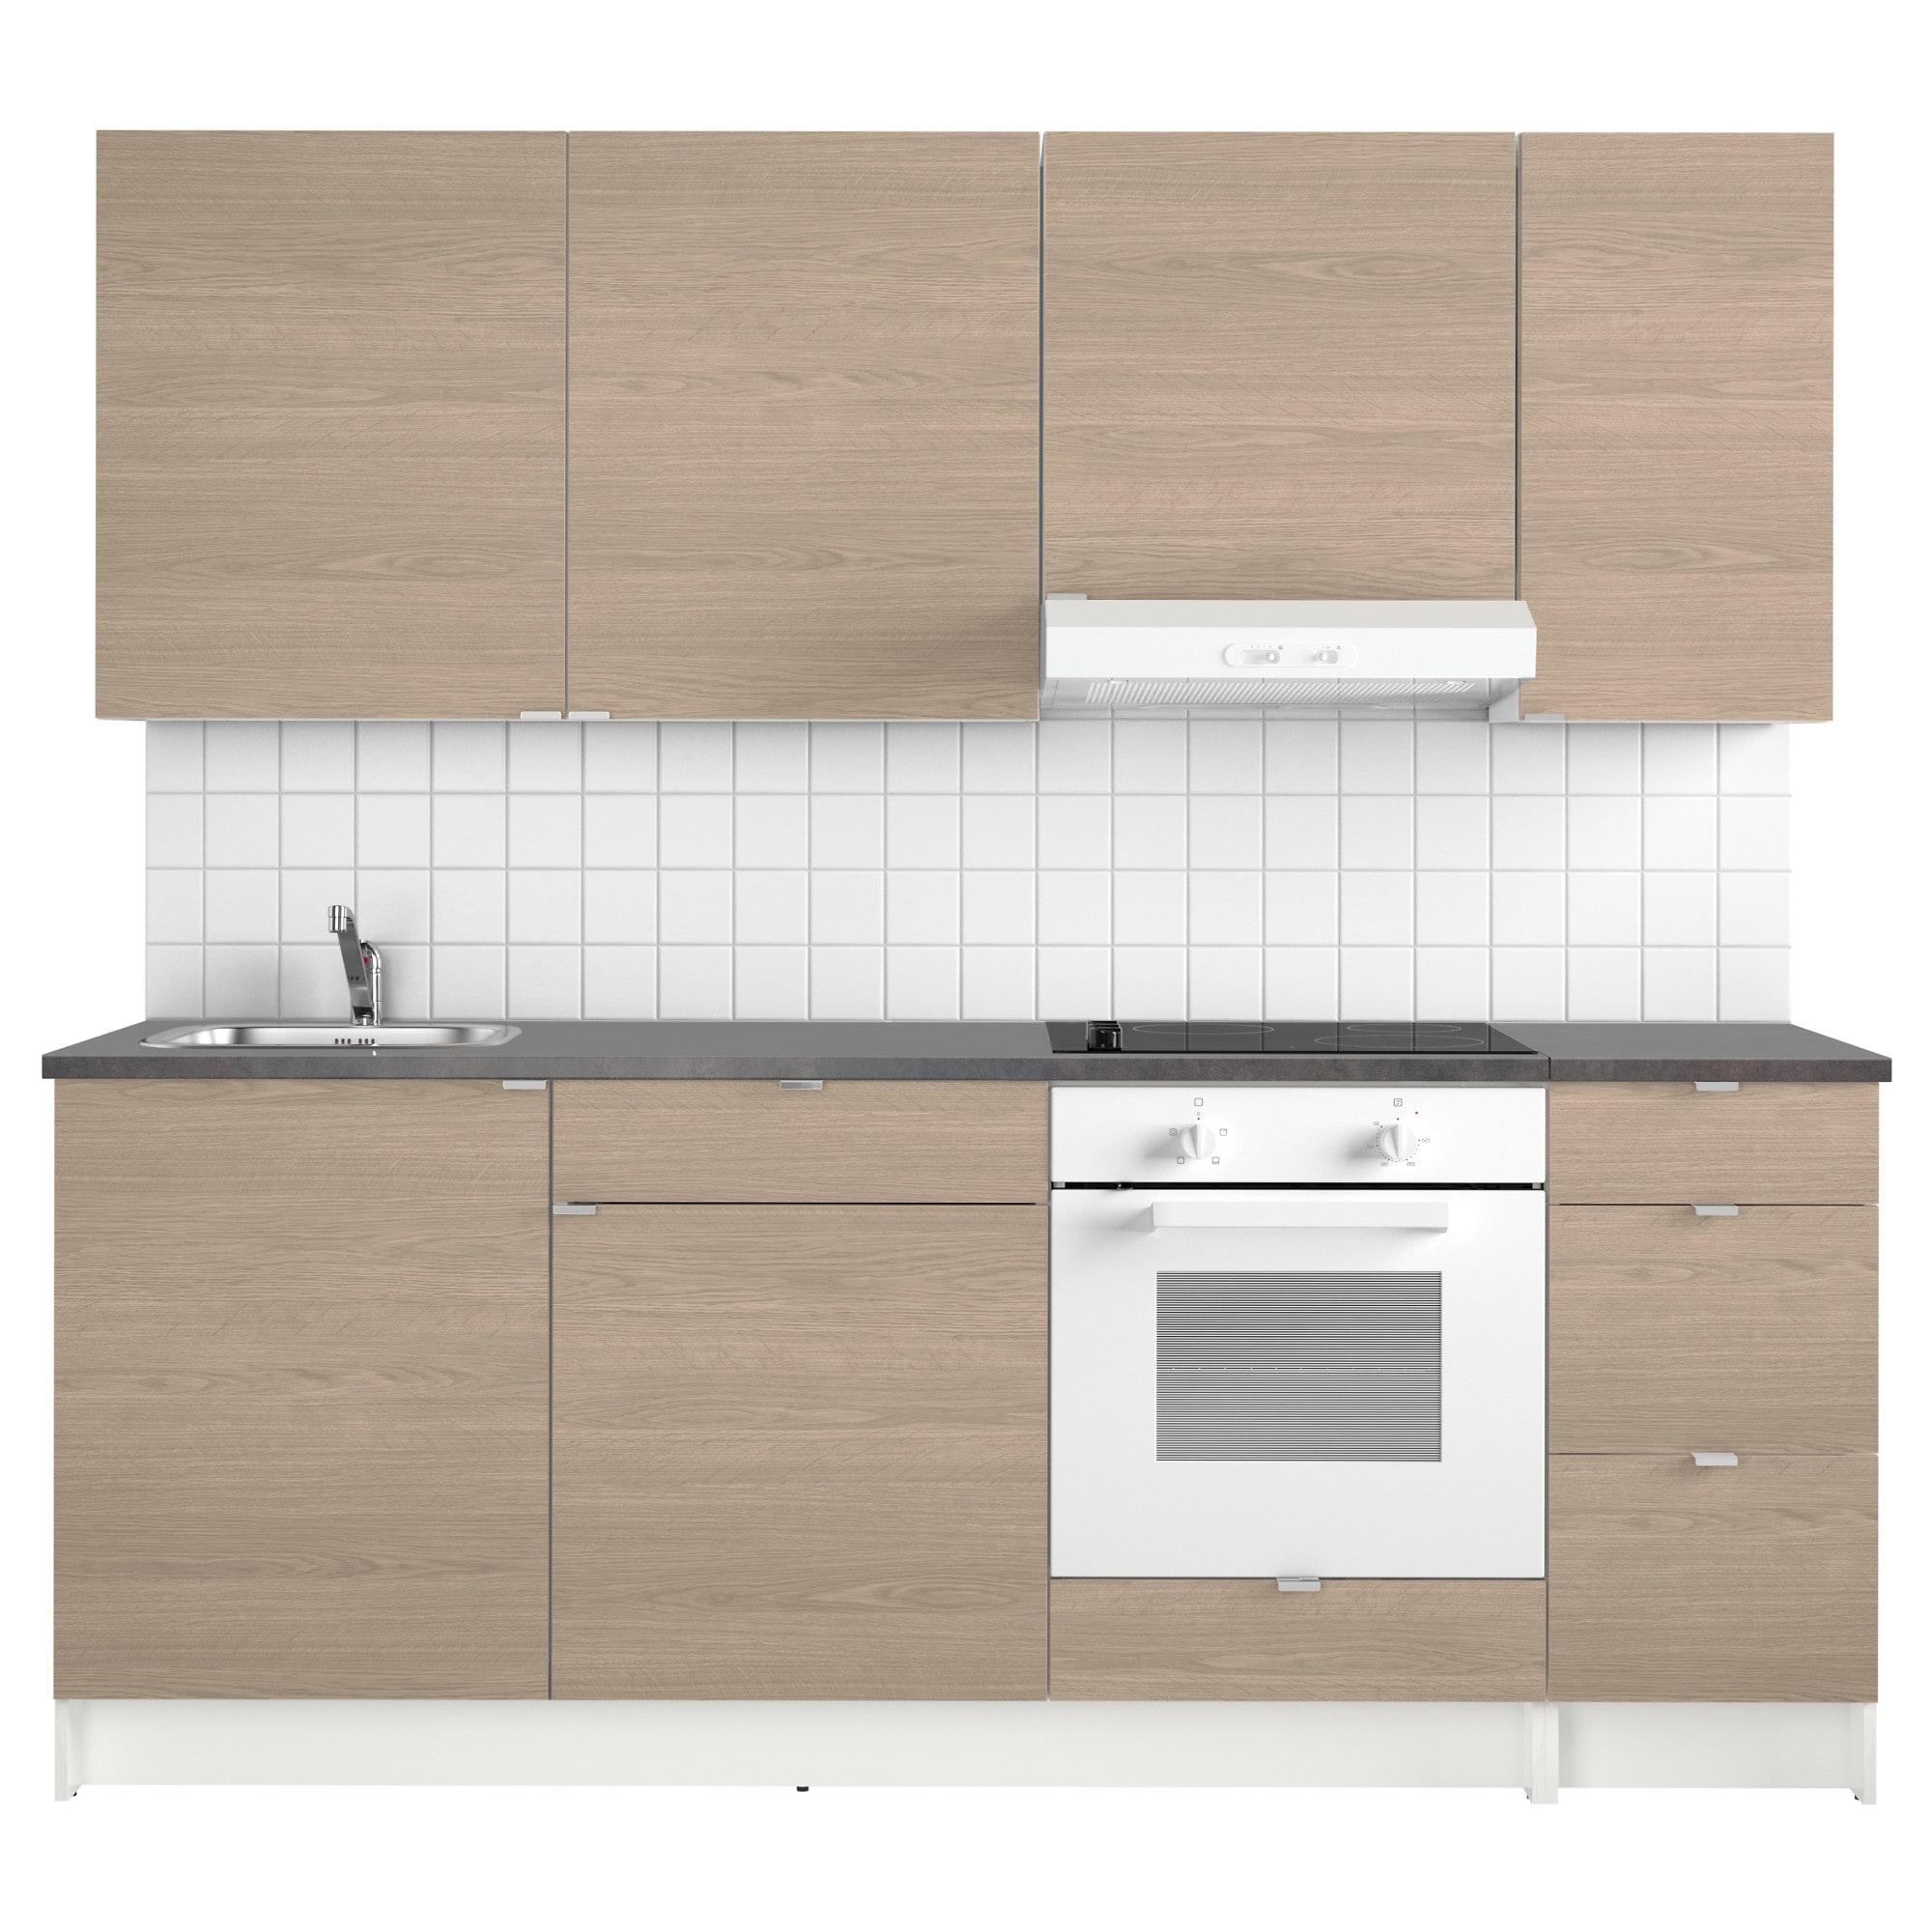 Muebles De Cocina En Kit Baratos X8d1 Lo Mejor De Muebles Cocina Kit ...